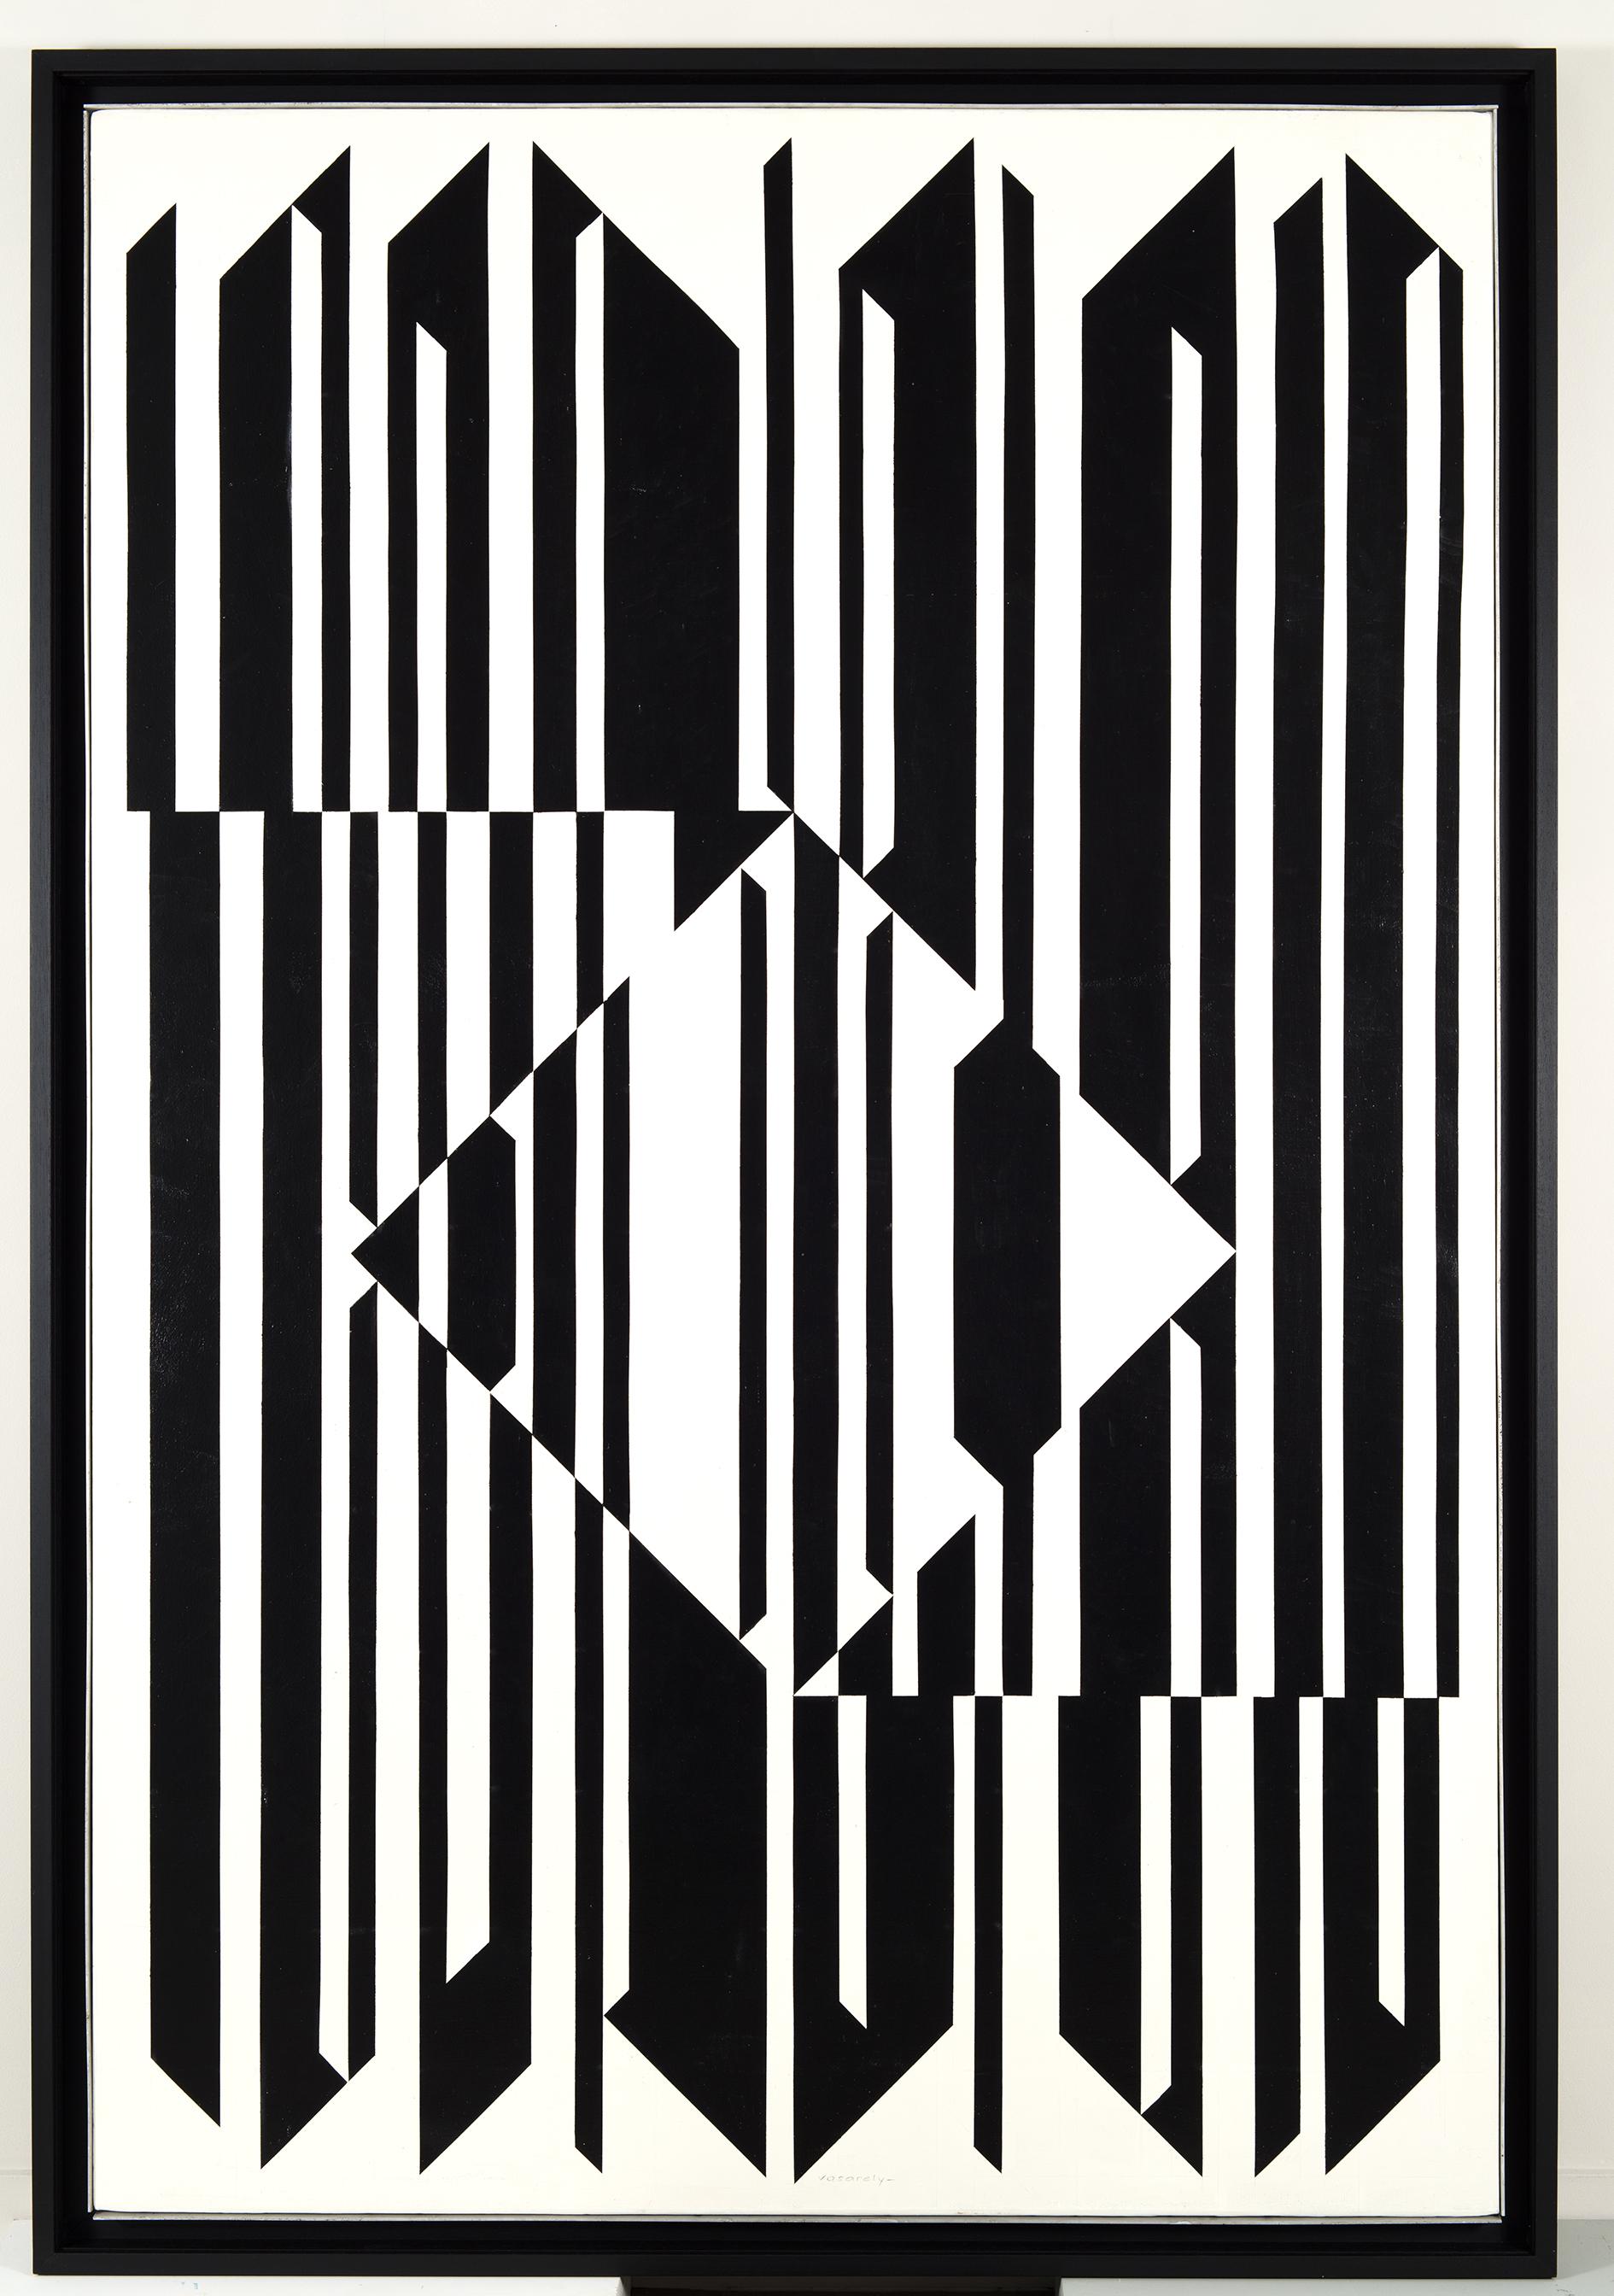 Leyre_GR, 1965, Victor Vasarely © fabrice lepeltier